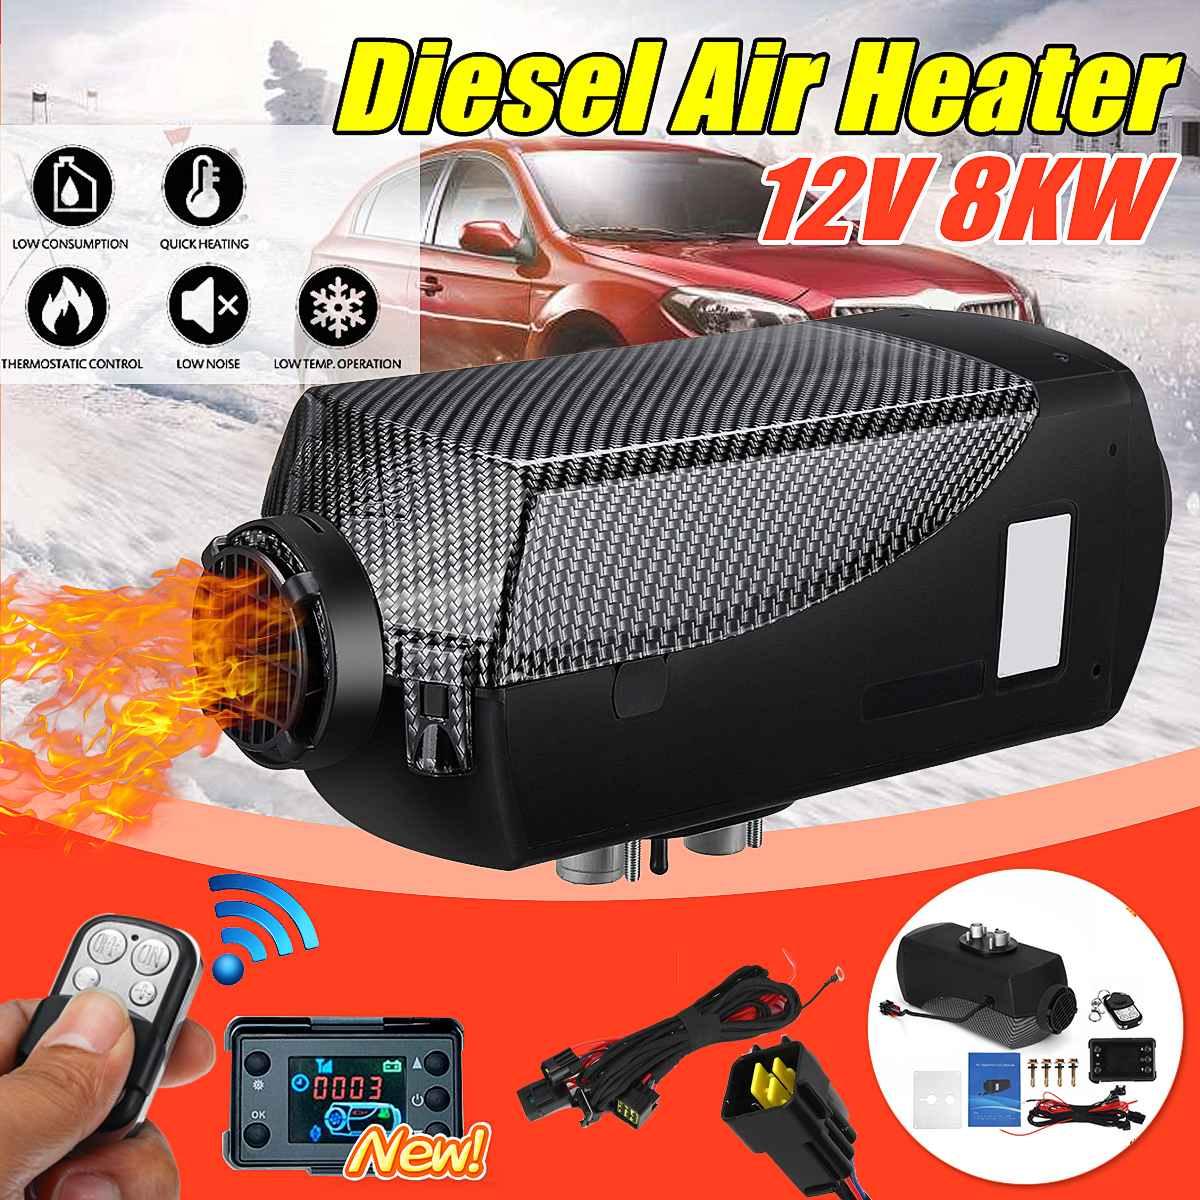 Newest Car Heater 12V 8000W Diesel Air Heater 8KW Black LCD Thermostat Remote Control FOR Car Boat RV Motorhome Trailer Trucks